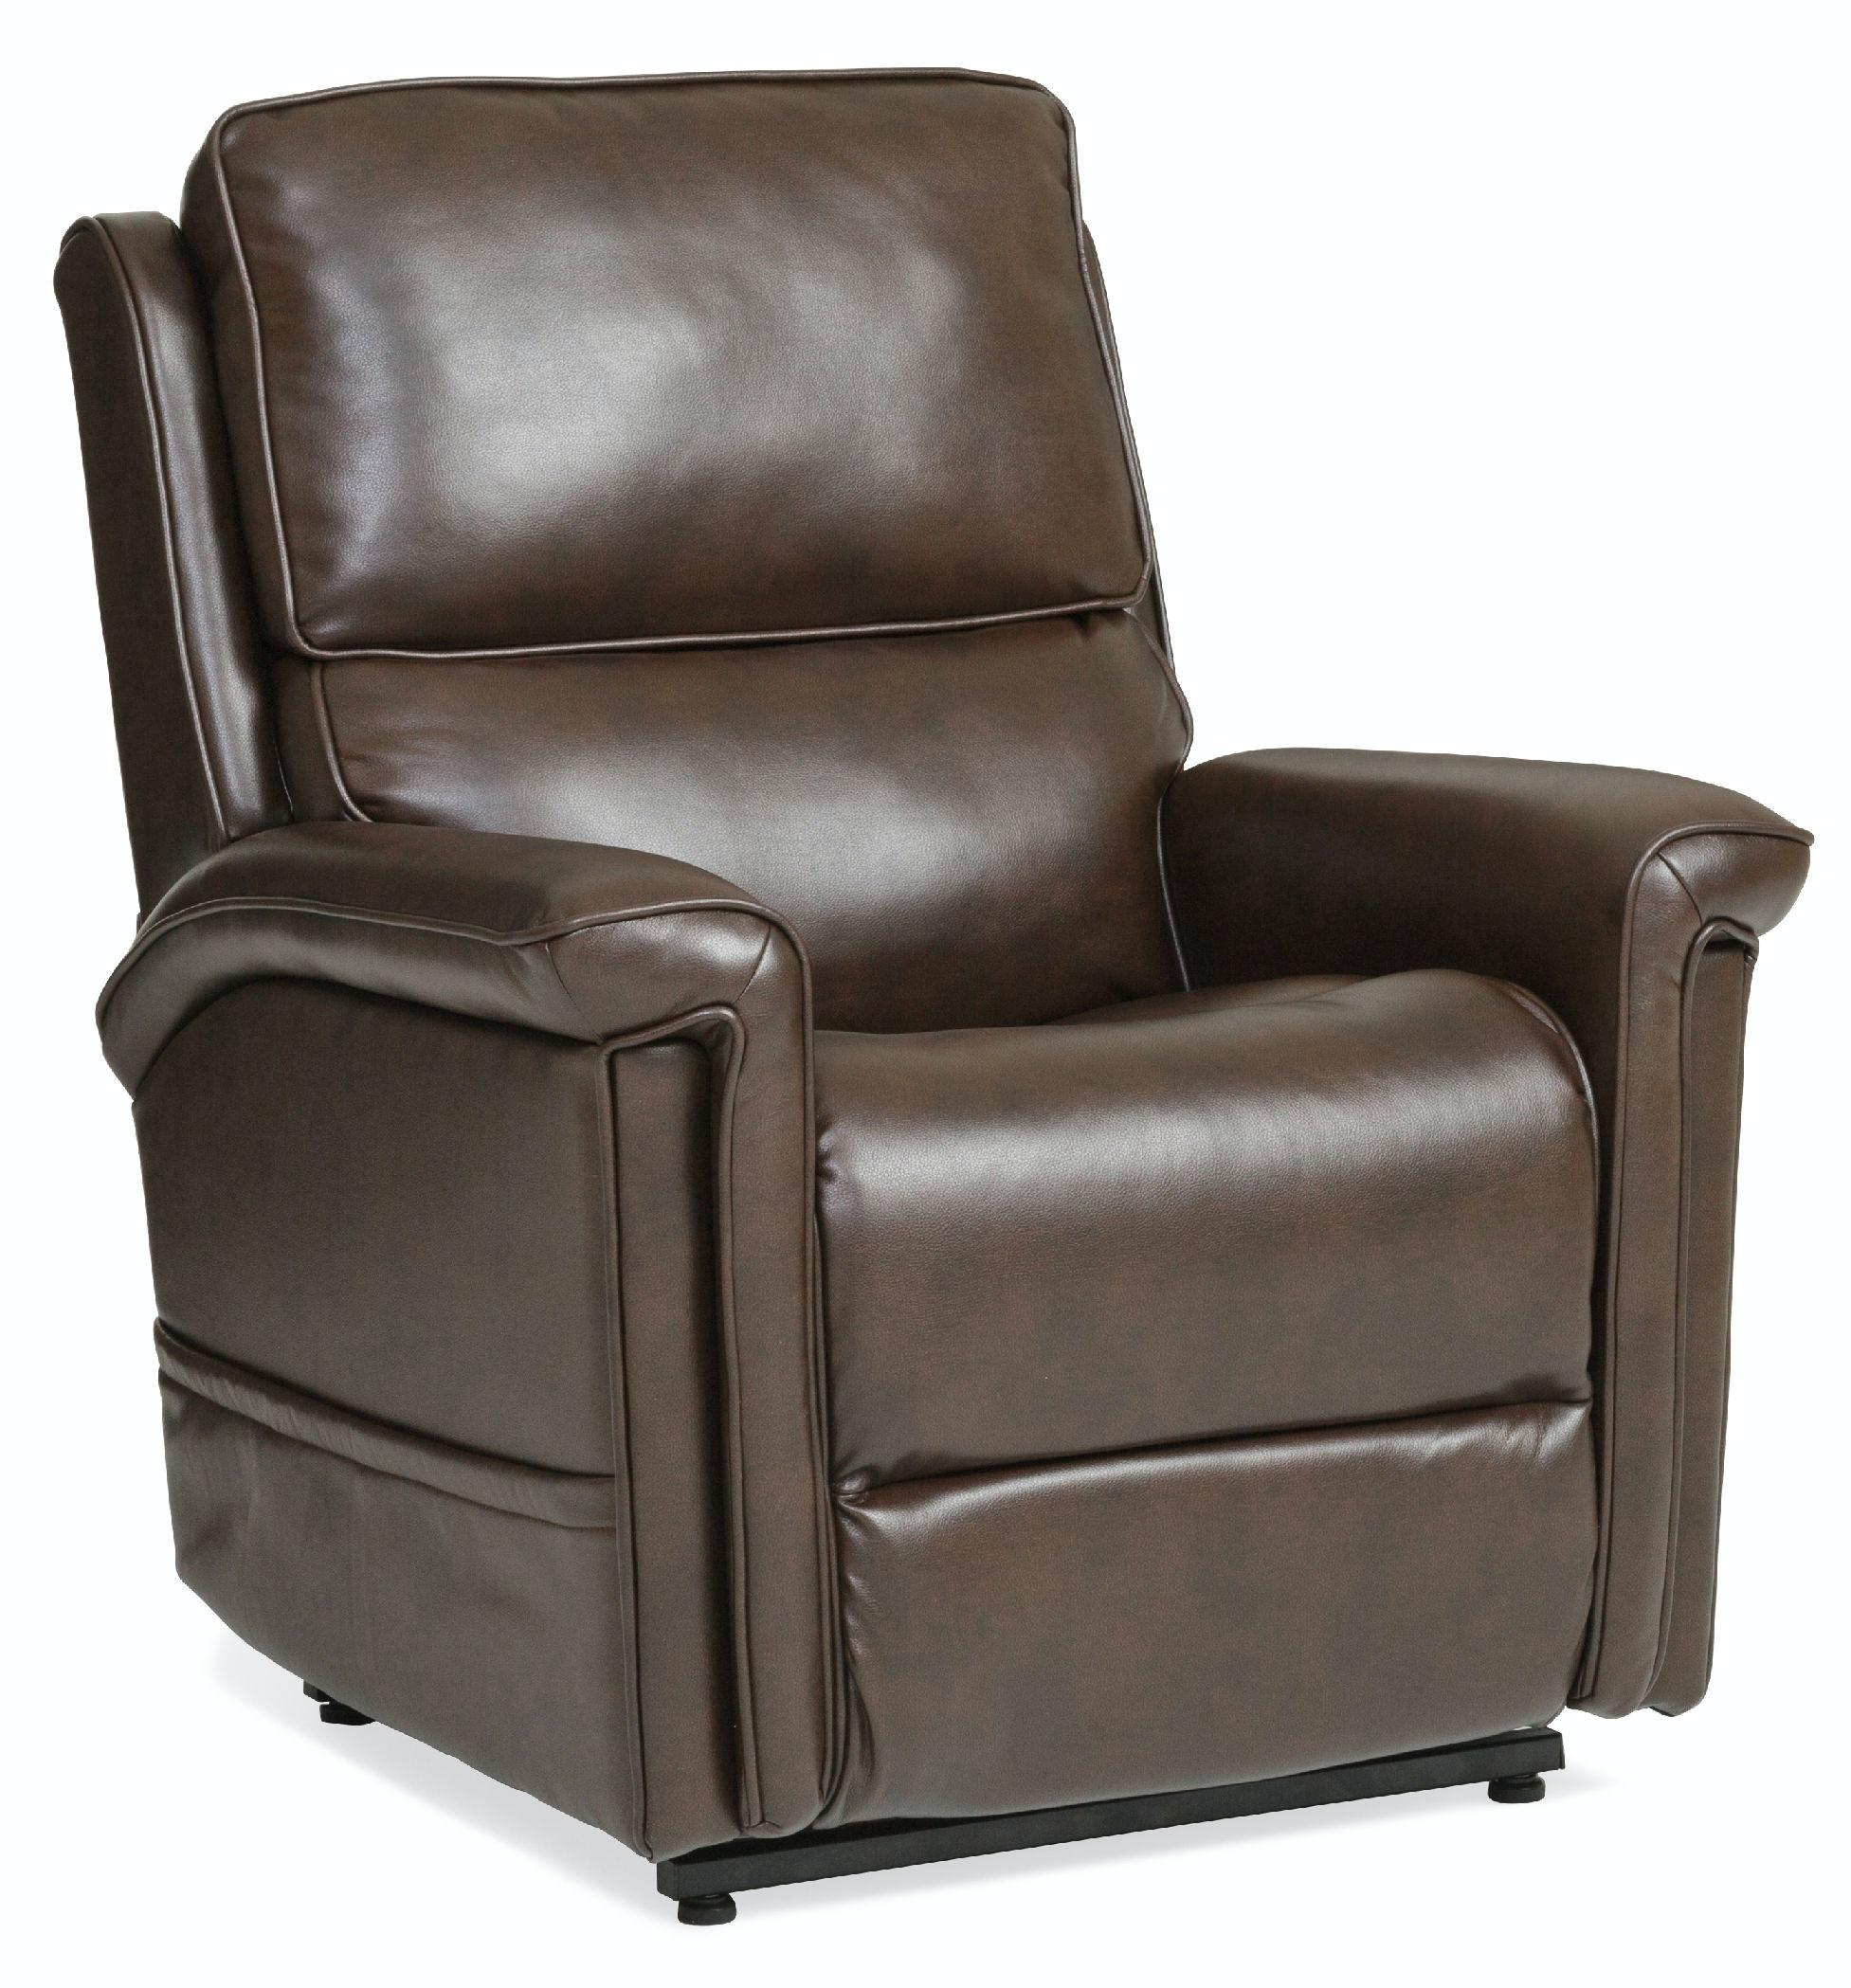 Living Room Samantha Lift Chair Recliner